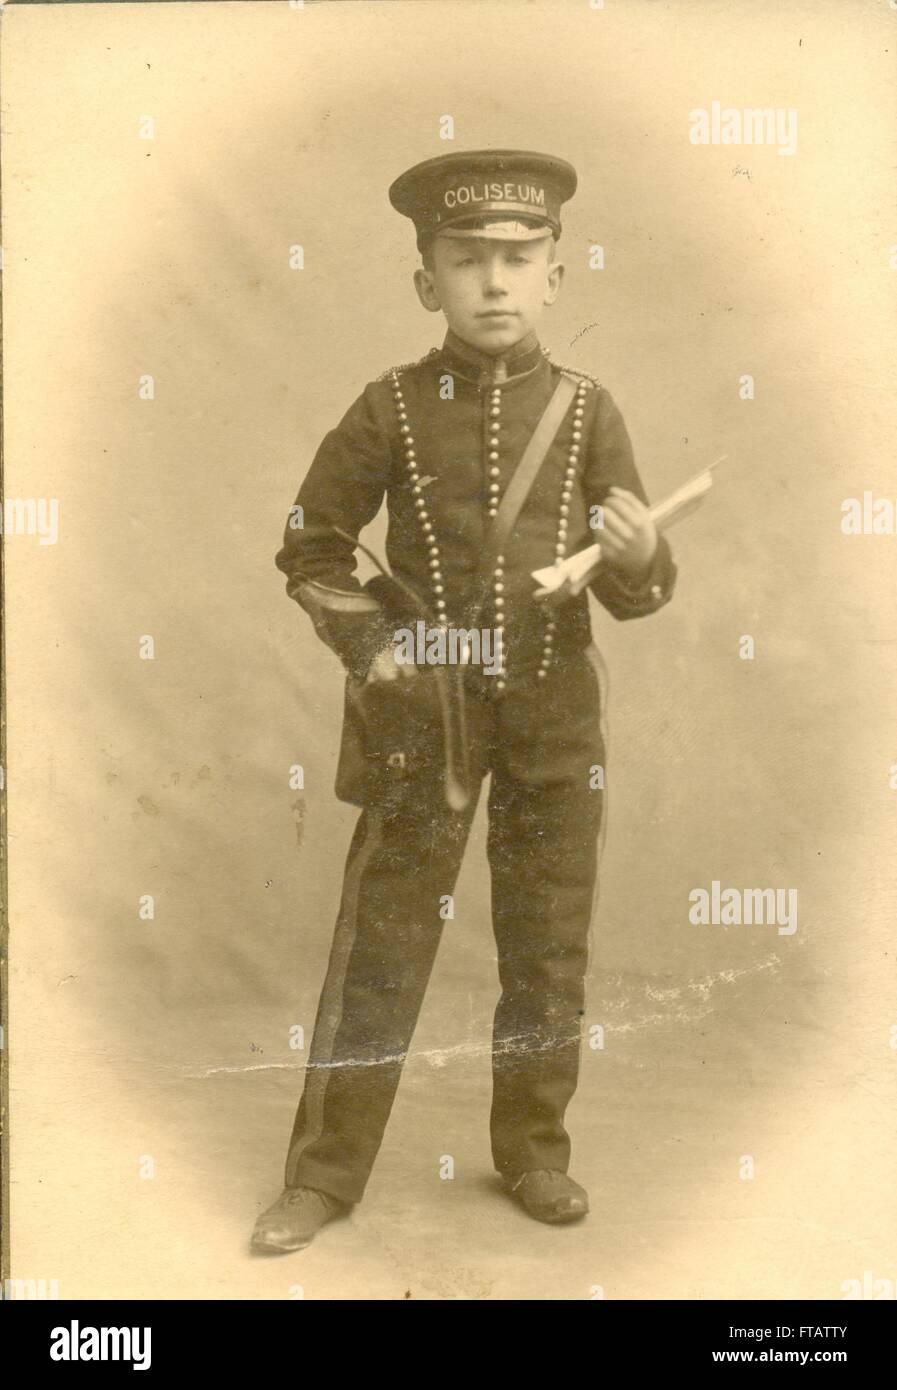 Portrait photograph of pageboy program seller.    London Coliseum designed by Frank Matcham - Stock Image